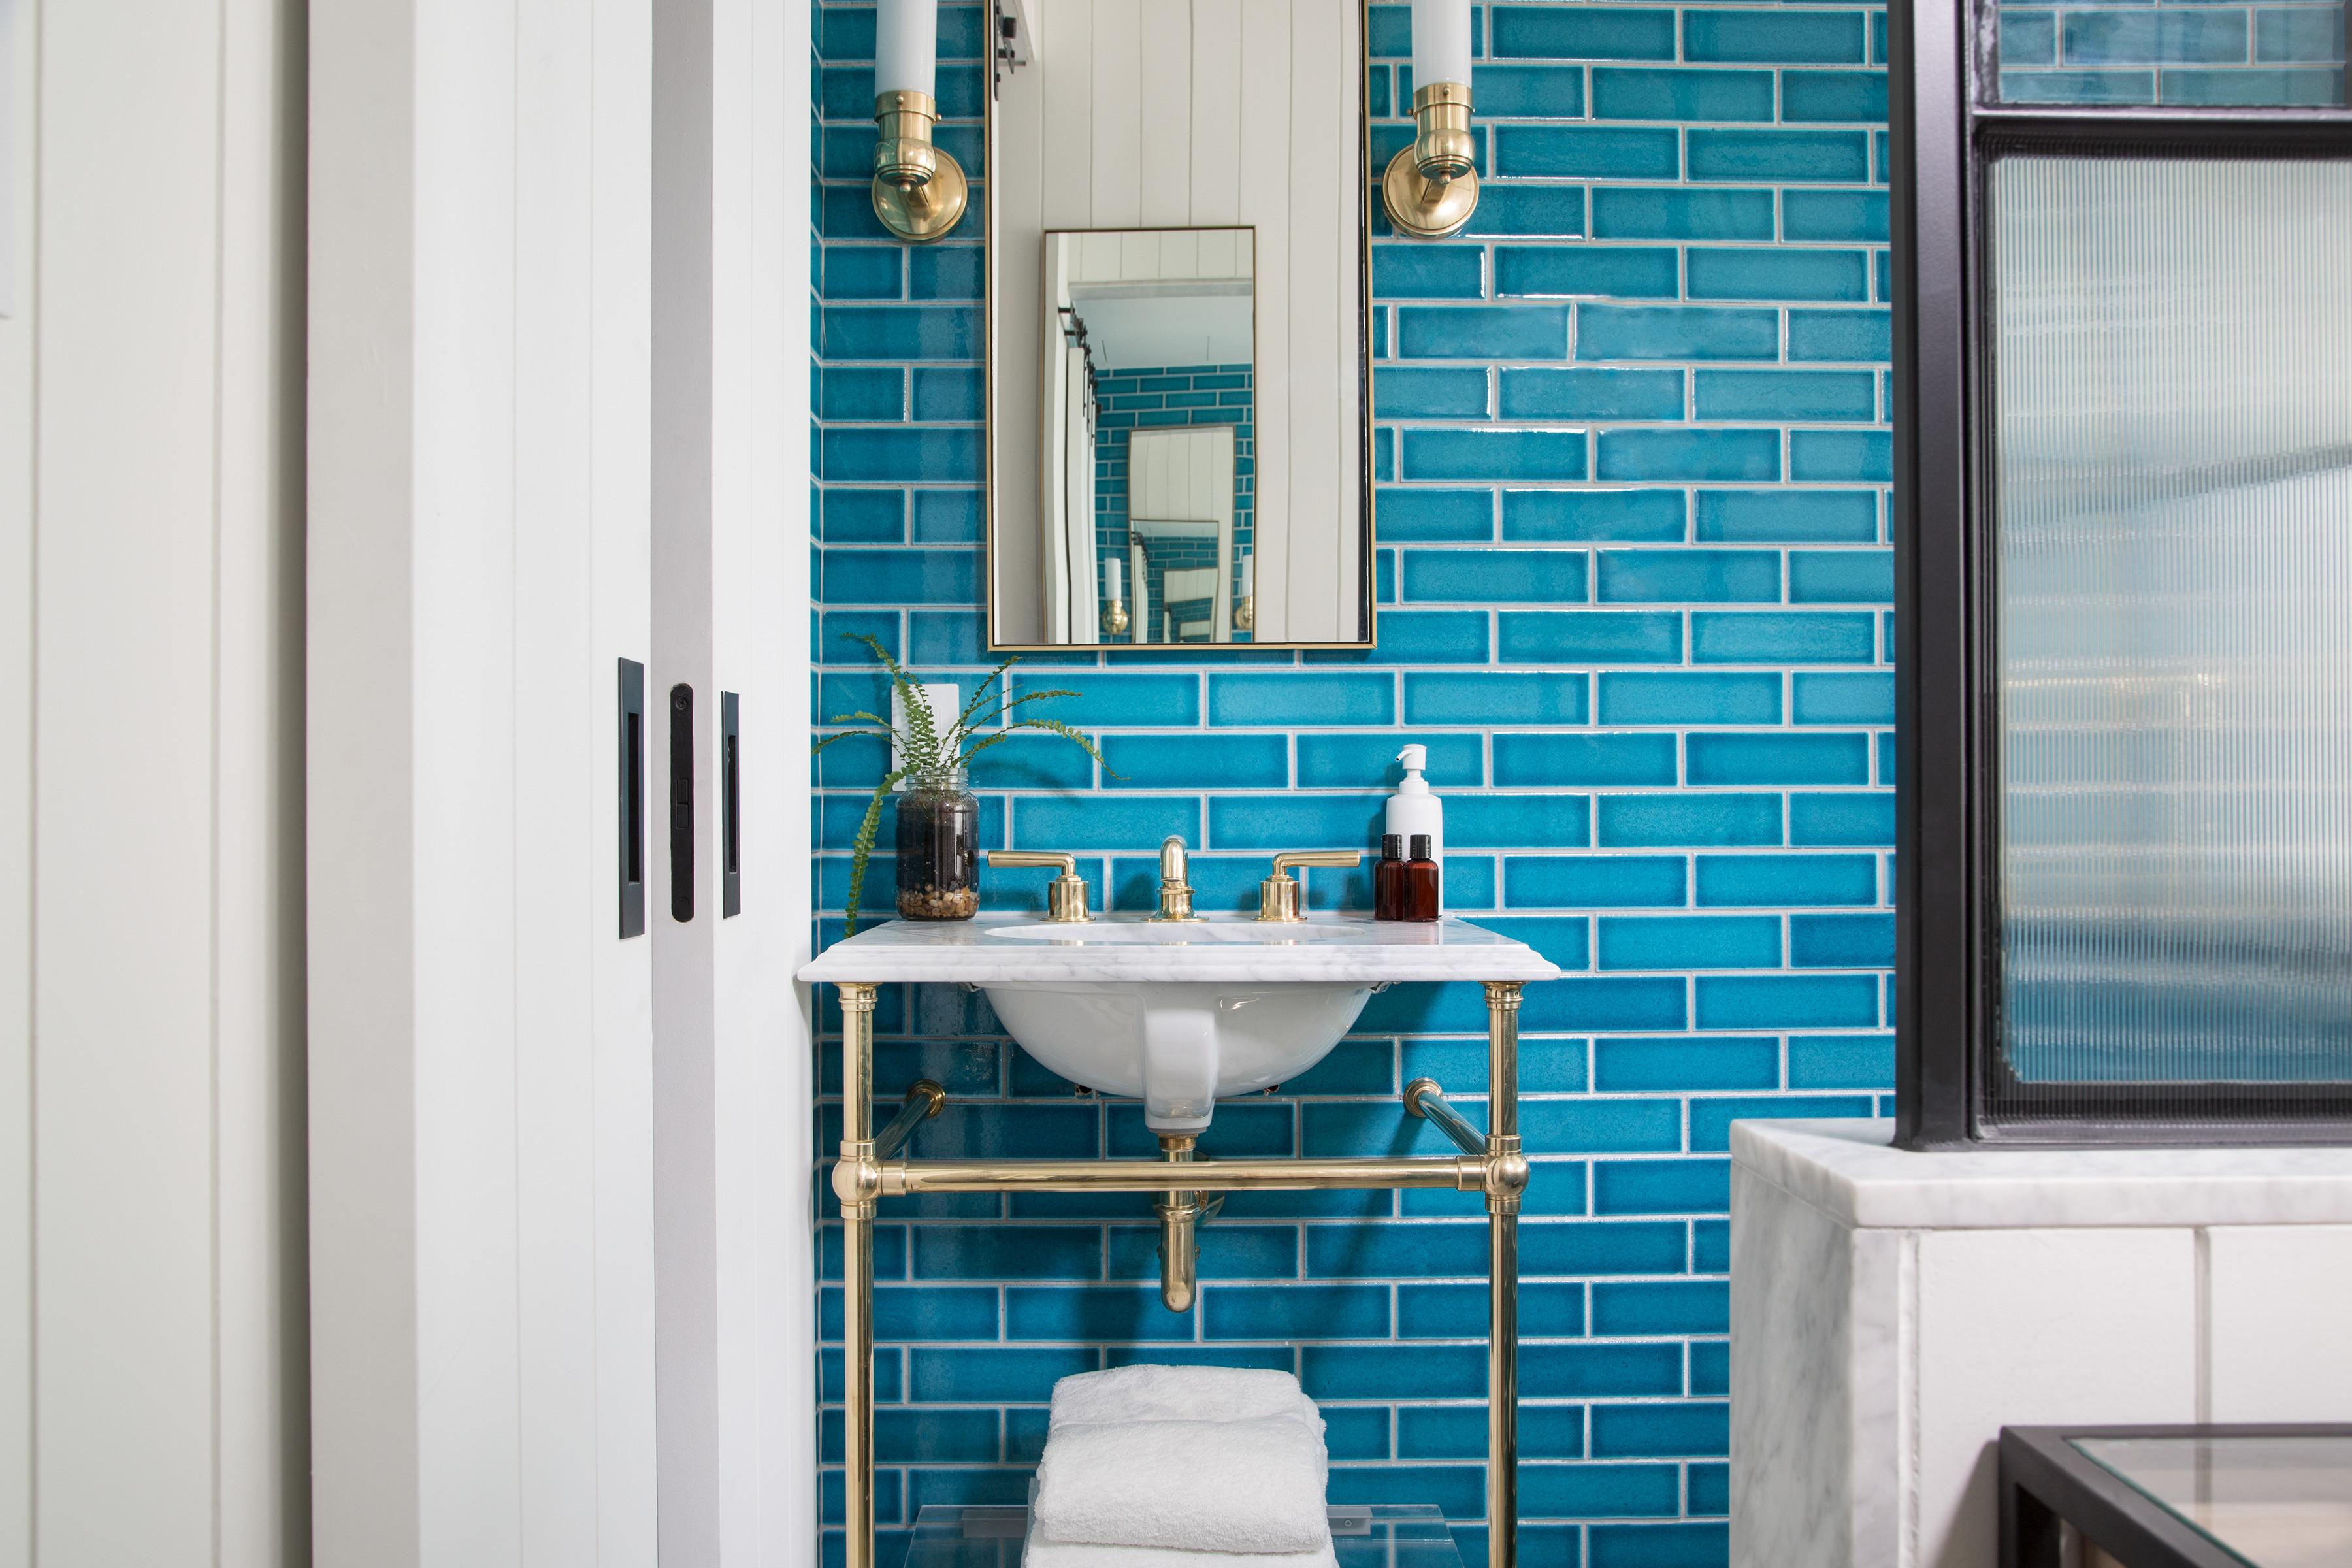 La salle de bain du Williamsburg Hotel